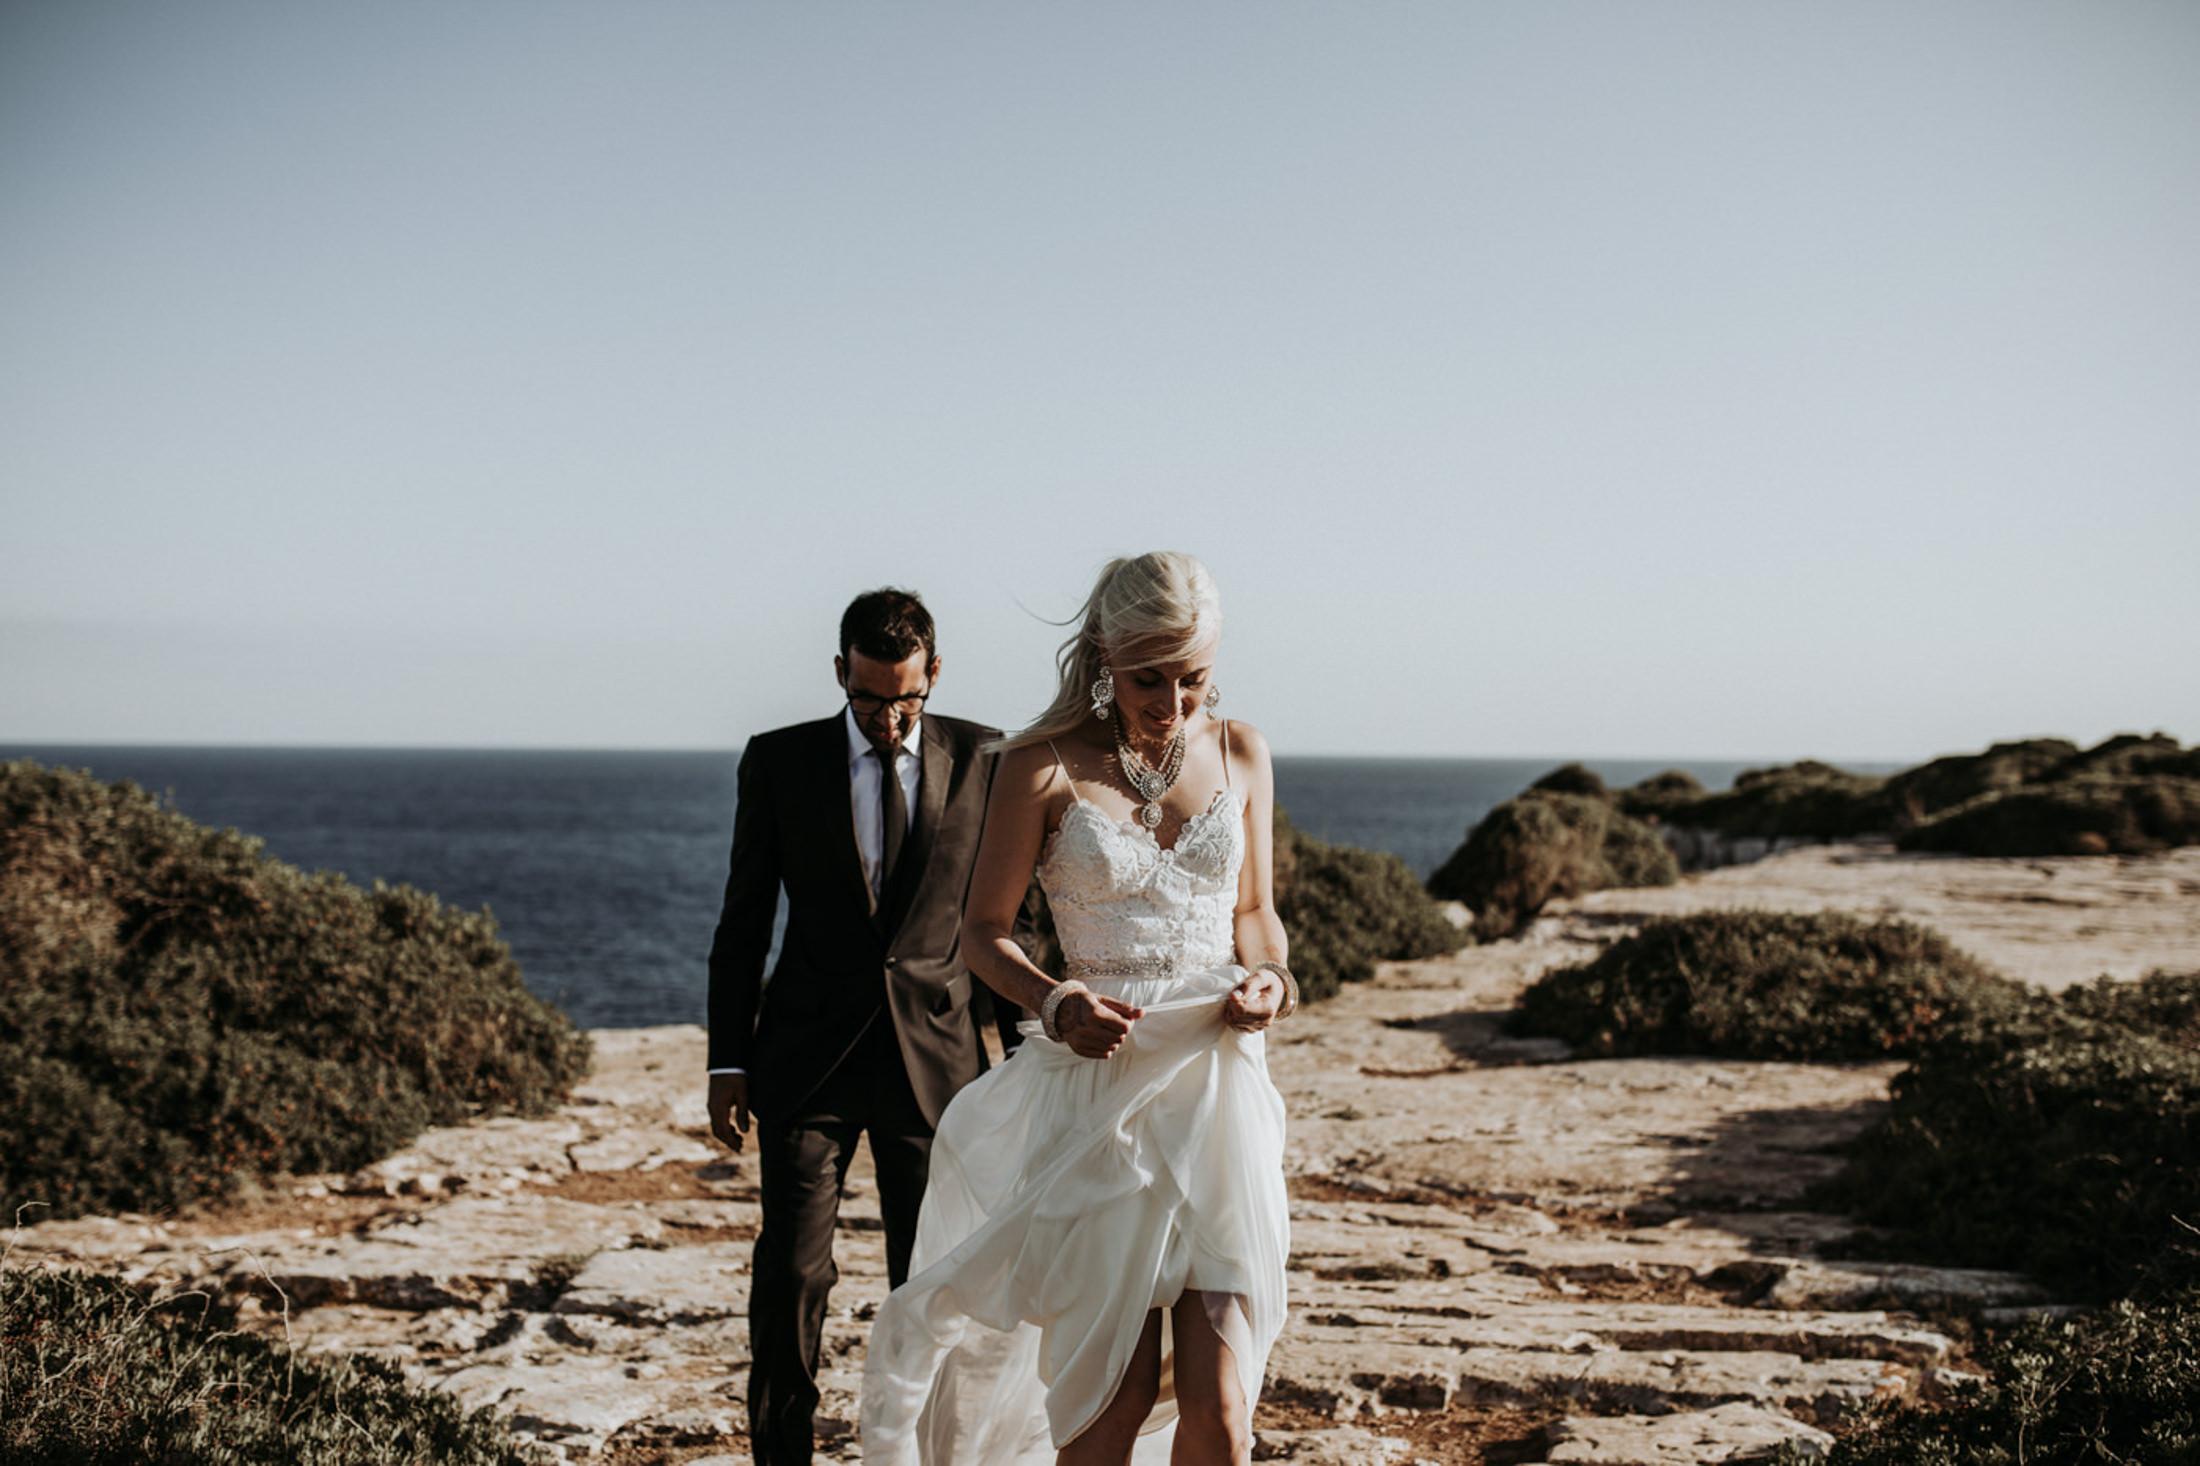 Wedding_Photographer_Mallorca_Daniela-Marquardt_Photography_New_York_Iceland_Tuscany_Santorini_Portugal_Austria_Bavaria_Elopement_Hochzeitsfotograf_AntjeRajat2_88